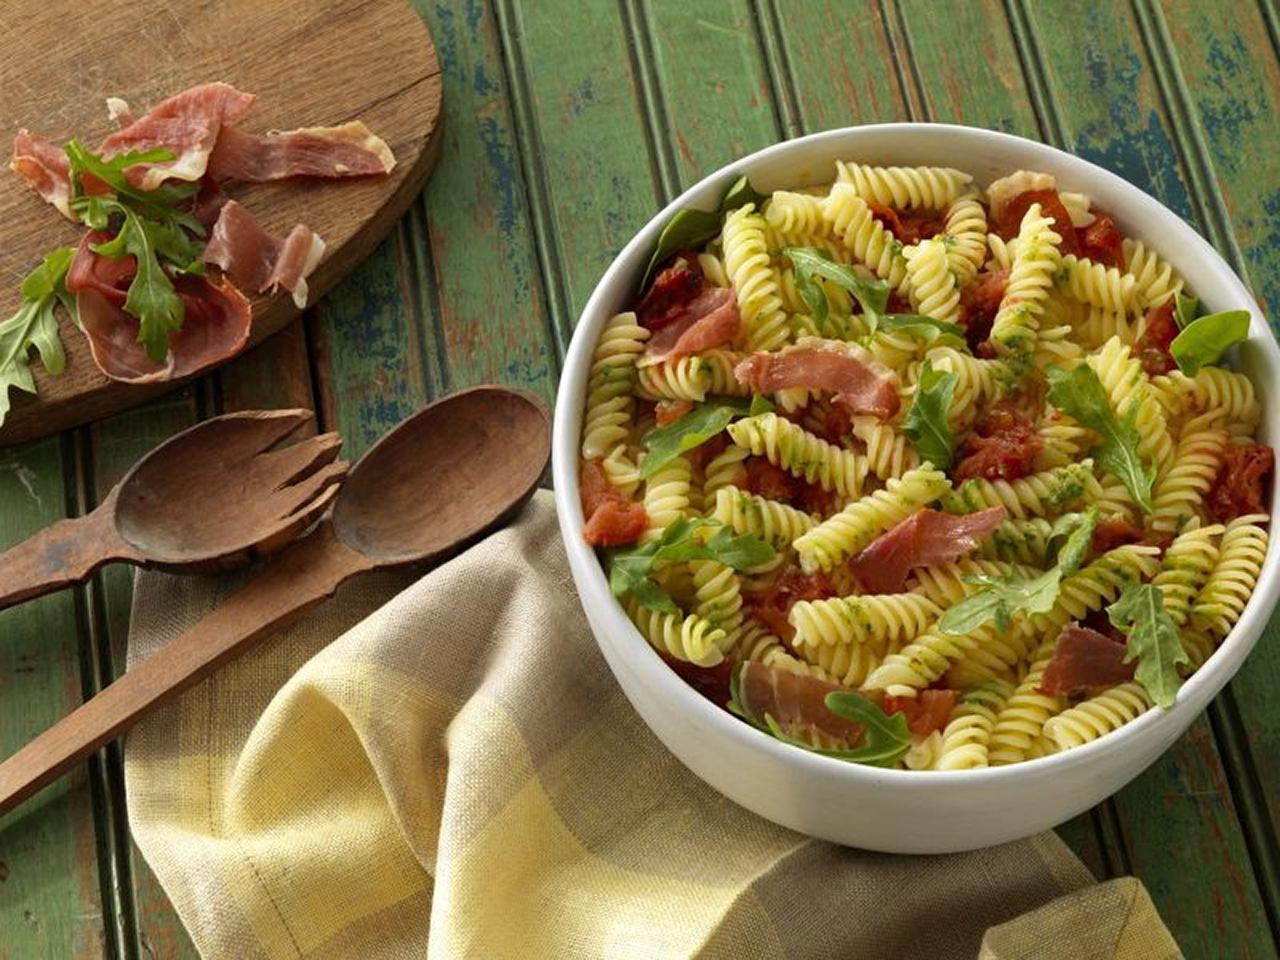 Barilla® Gluten Free Rotini with Basil Pesto, Arugula, Roasted Tomatoes and Crispy Prosciutto